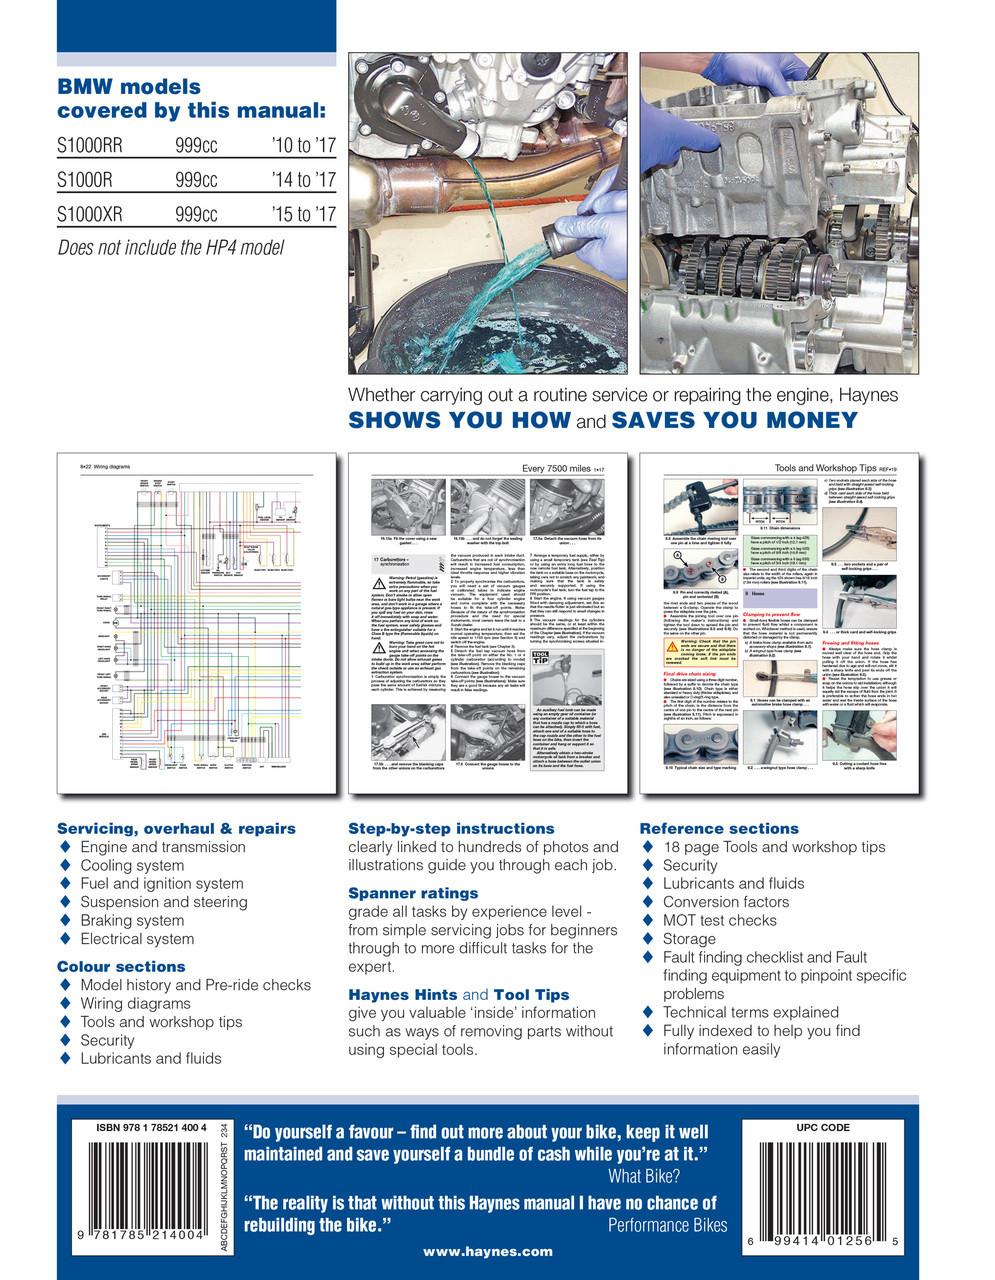 hight resolution of bmw s1000rr s1000r s1000xr 2010 2017 workshop manual bmw 2002 wiring diagram pdf